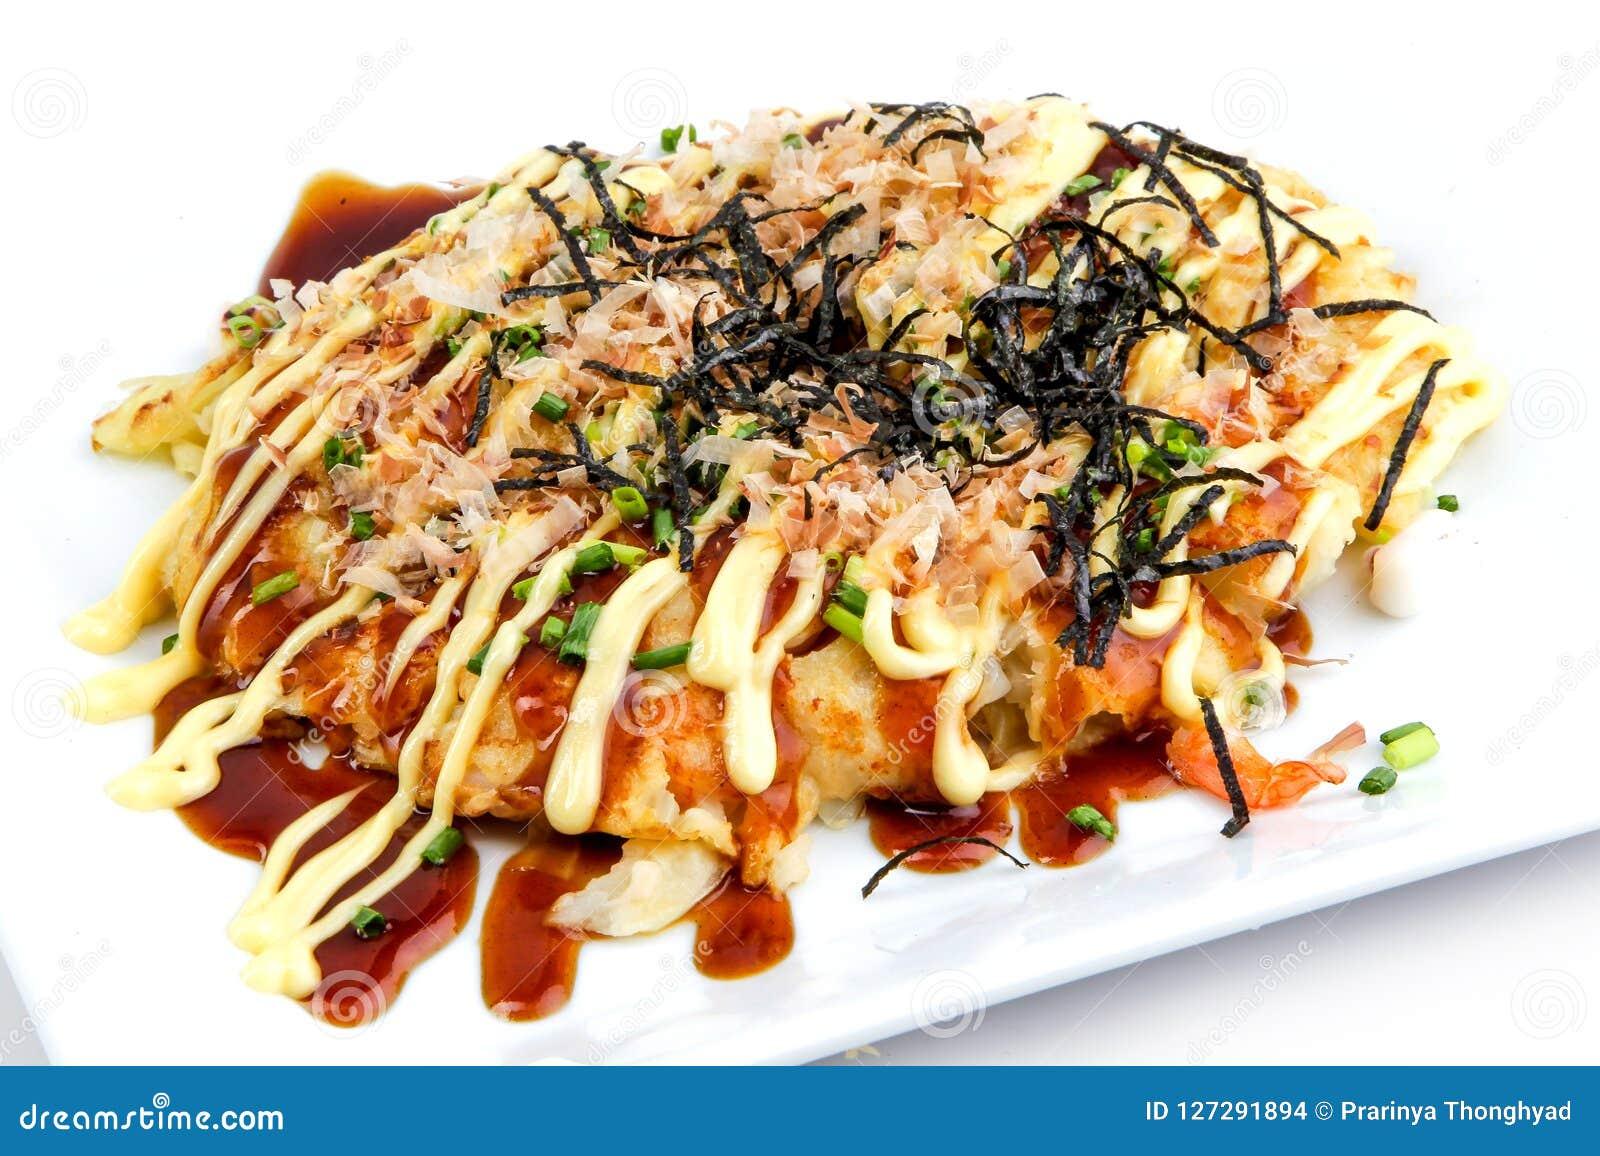 Japanese Pizza Style Okonomiyaki Kansai Stock Photo Image Of Meal Gourmet 127291894